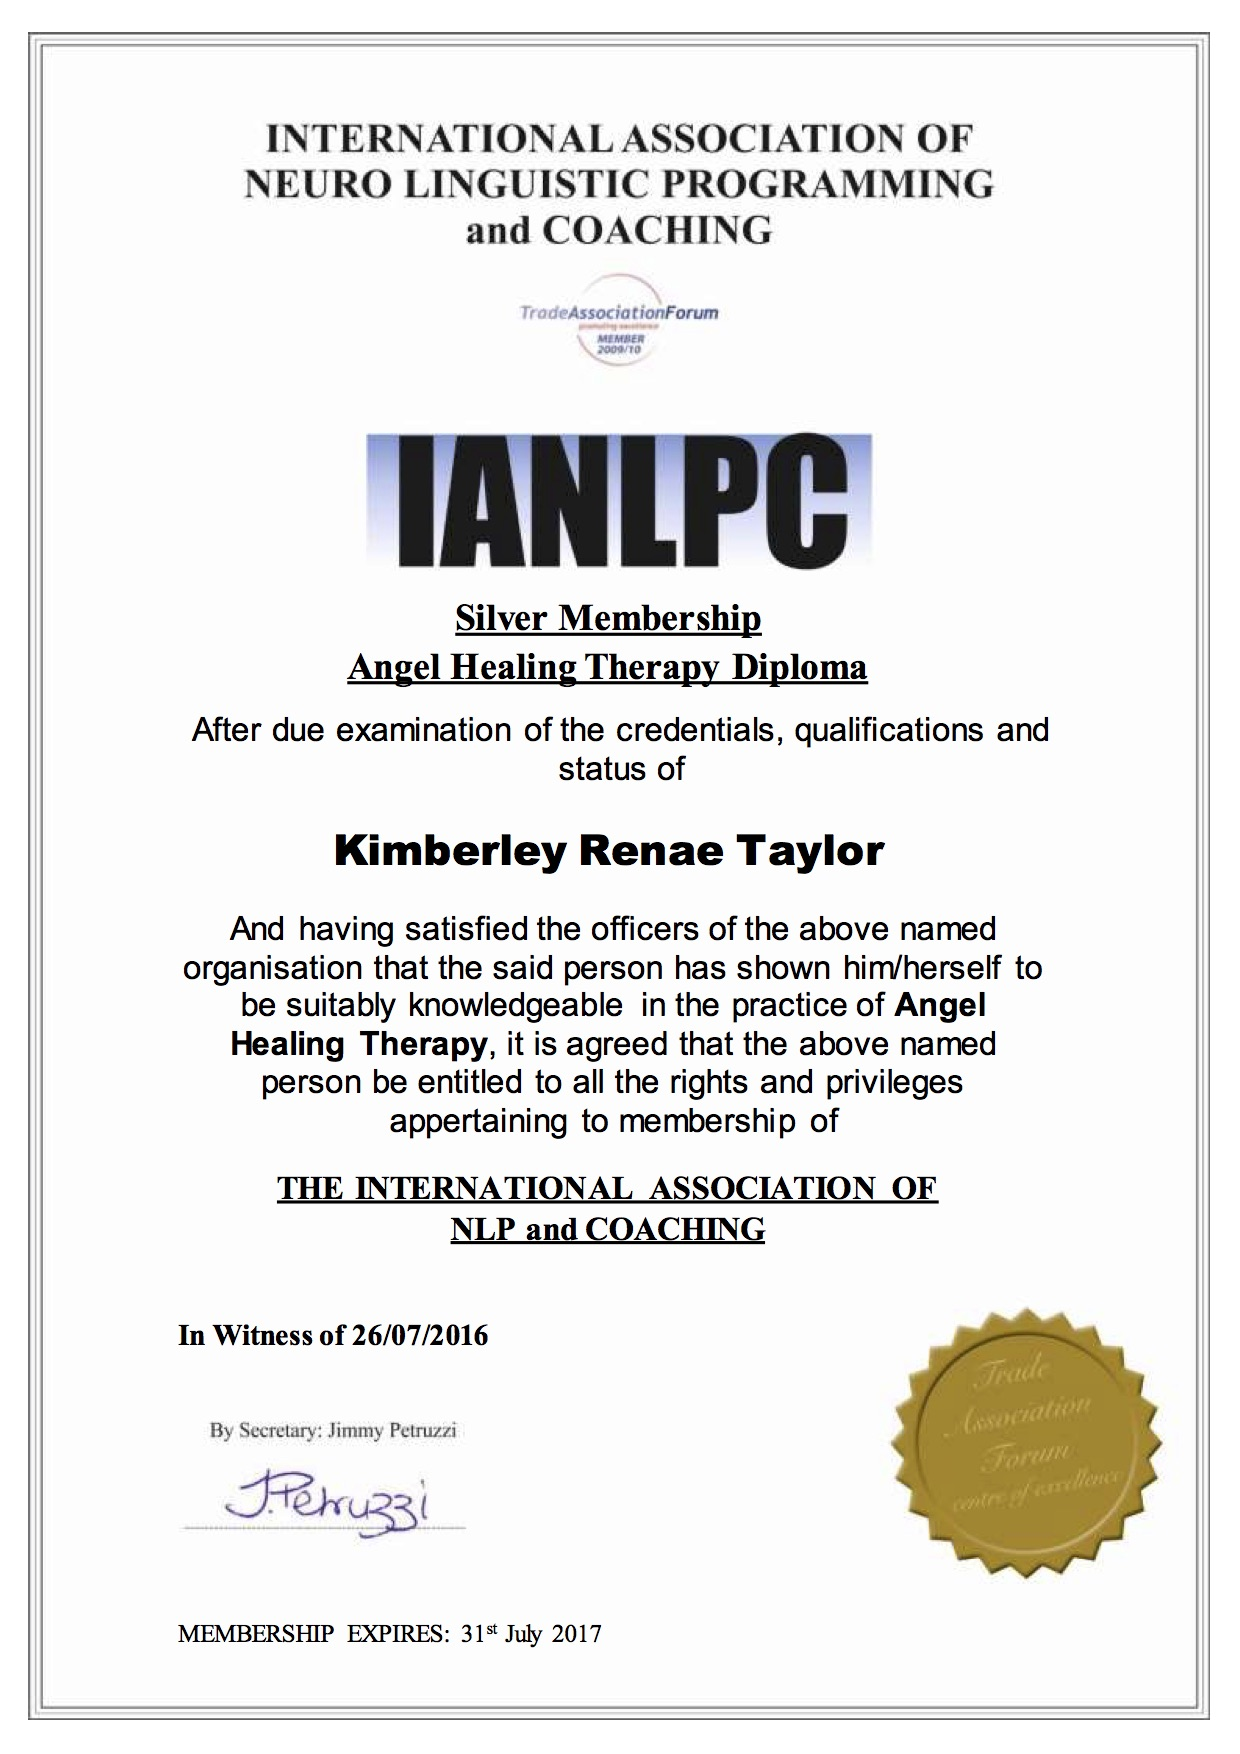 IANLPC Angel Healing Therapy Diploma Kimberley Renae Taylor